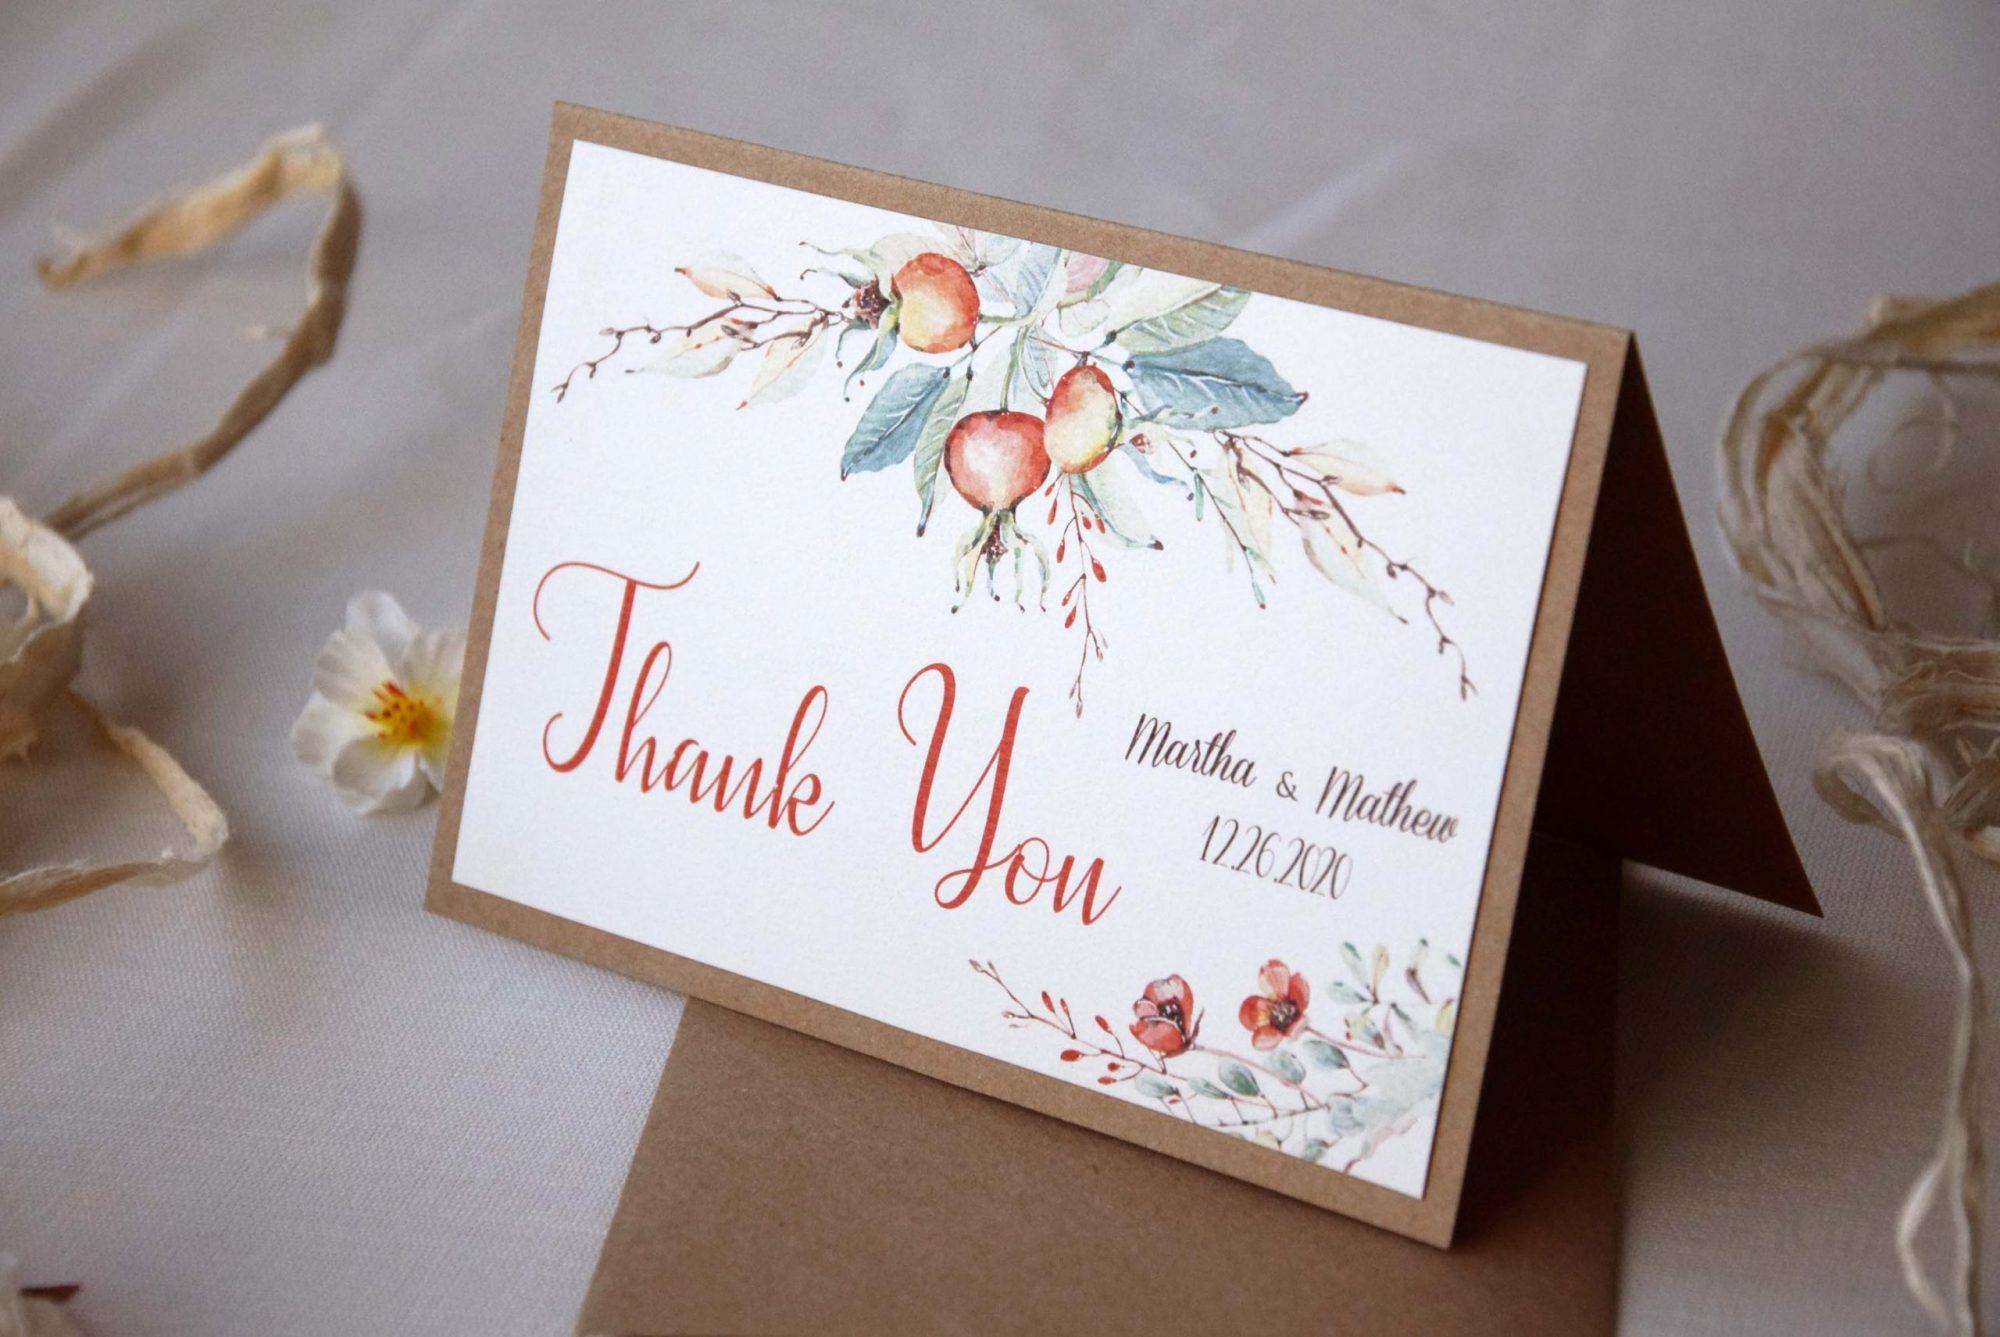 Affordable Weddings Leaves Bridal Shower Wedding Thank You Cards Thank You Cards Autumn Wedding Squirrels Fall Weddings Pumpkins